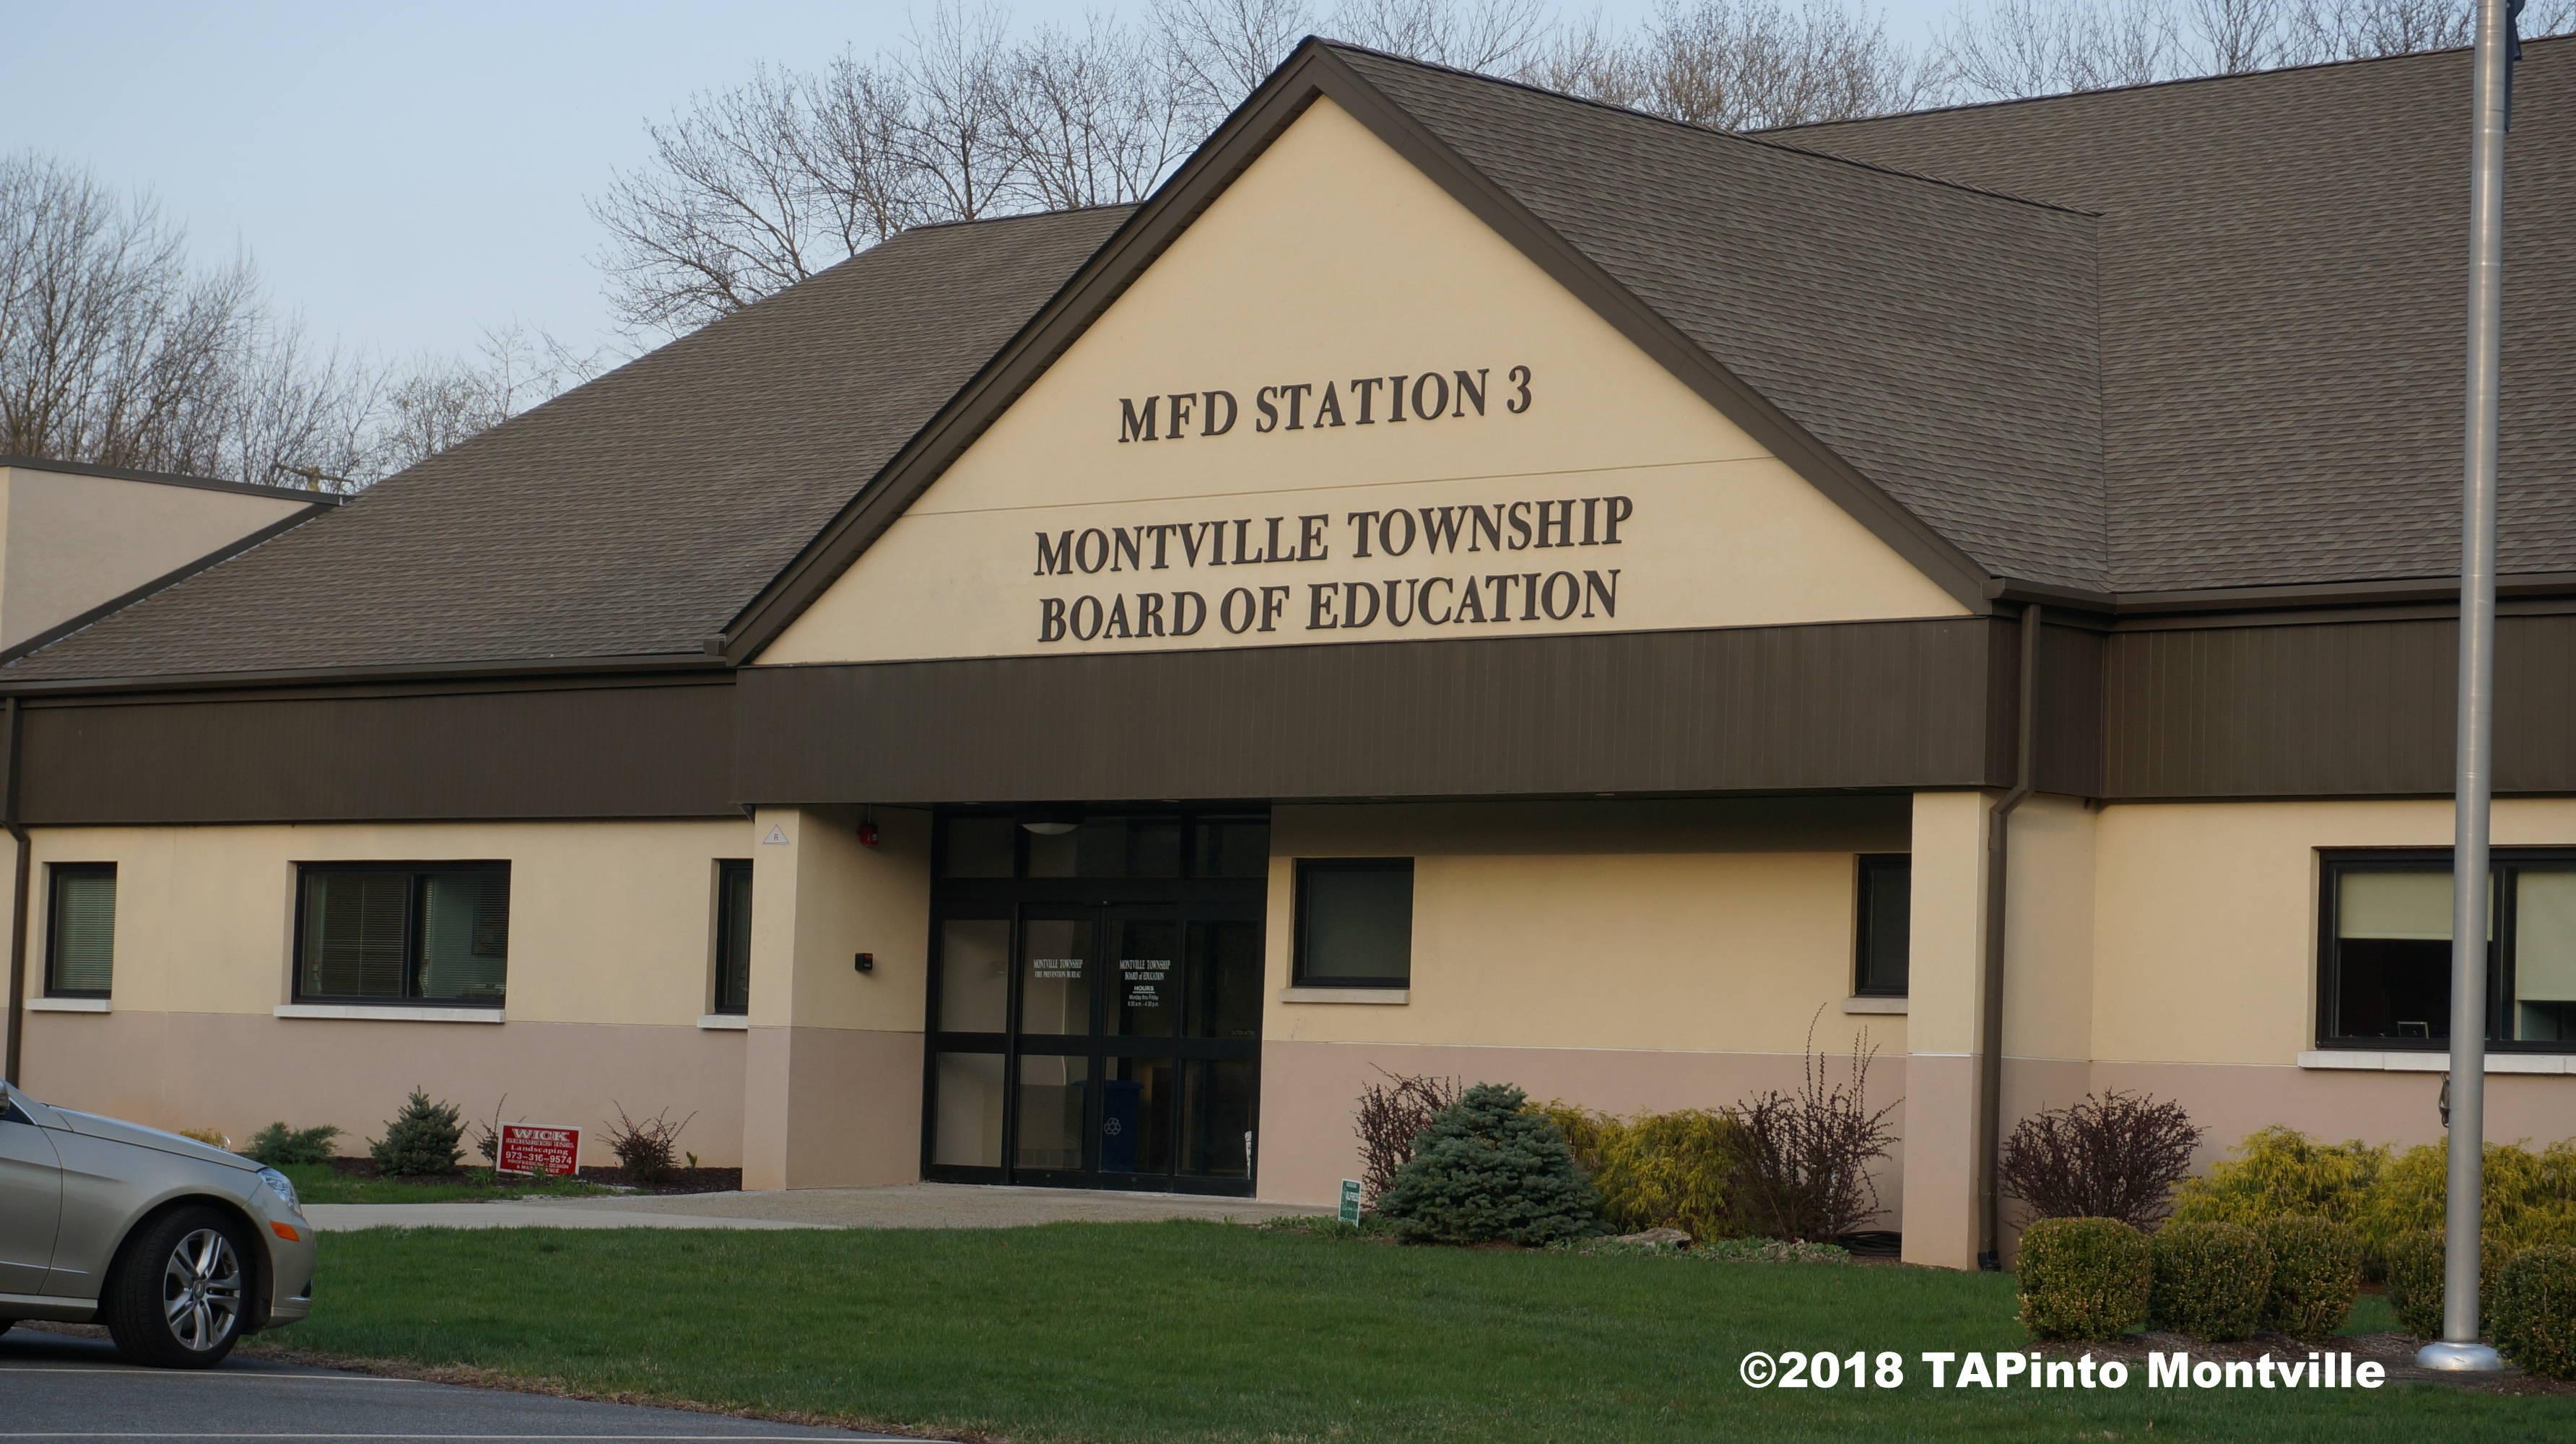 Montville Township Public Schools - Closed - TAPinto